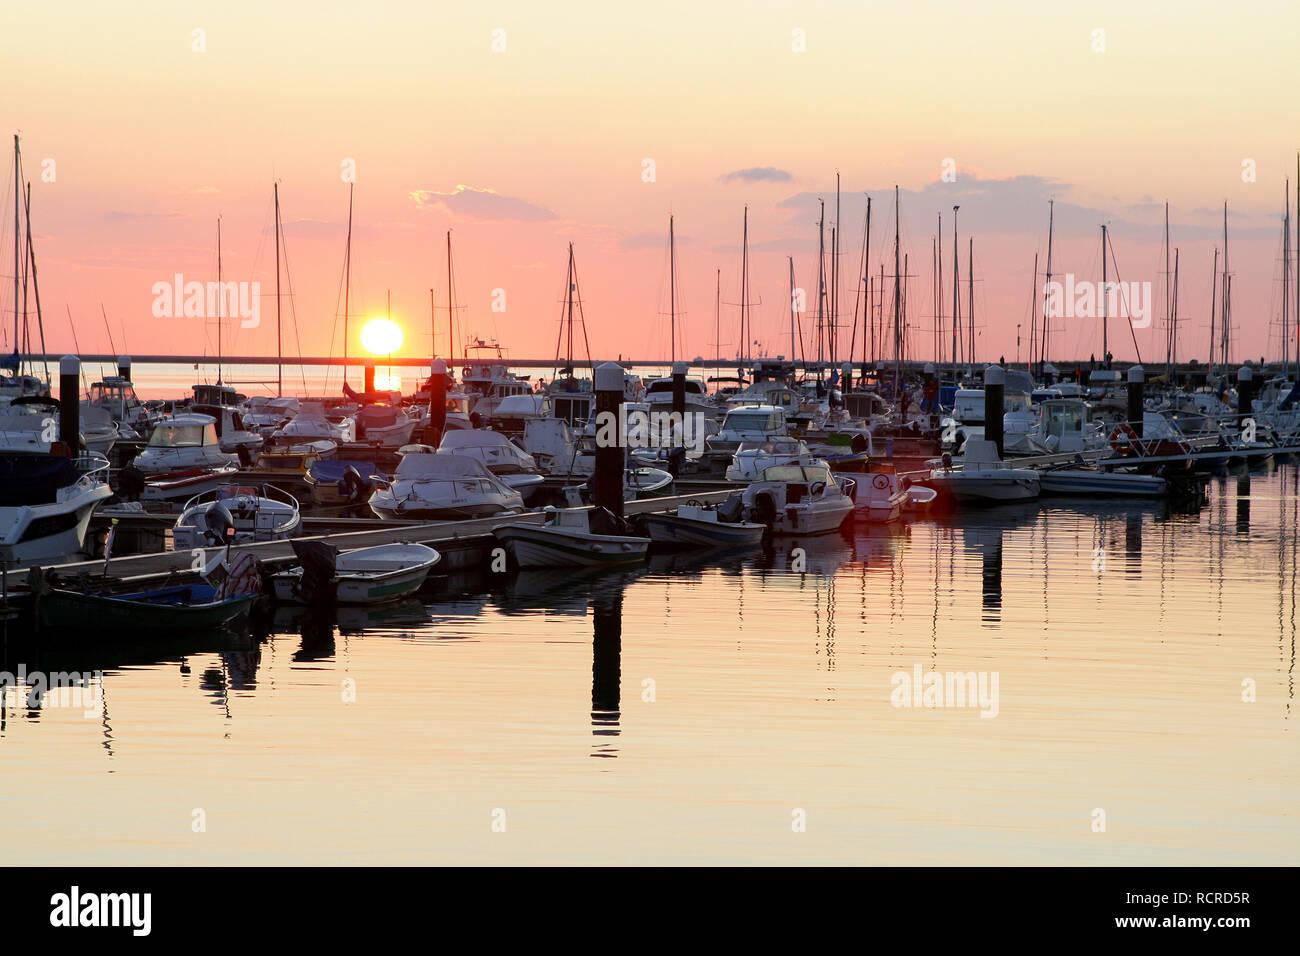 Pôr do sol na marina de Olhão, Algarve, Portugal Stock Photo